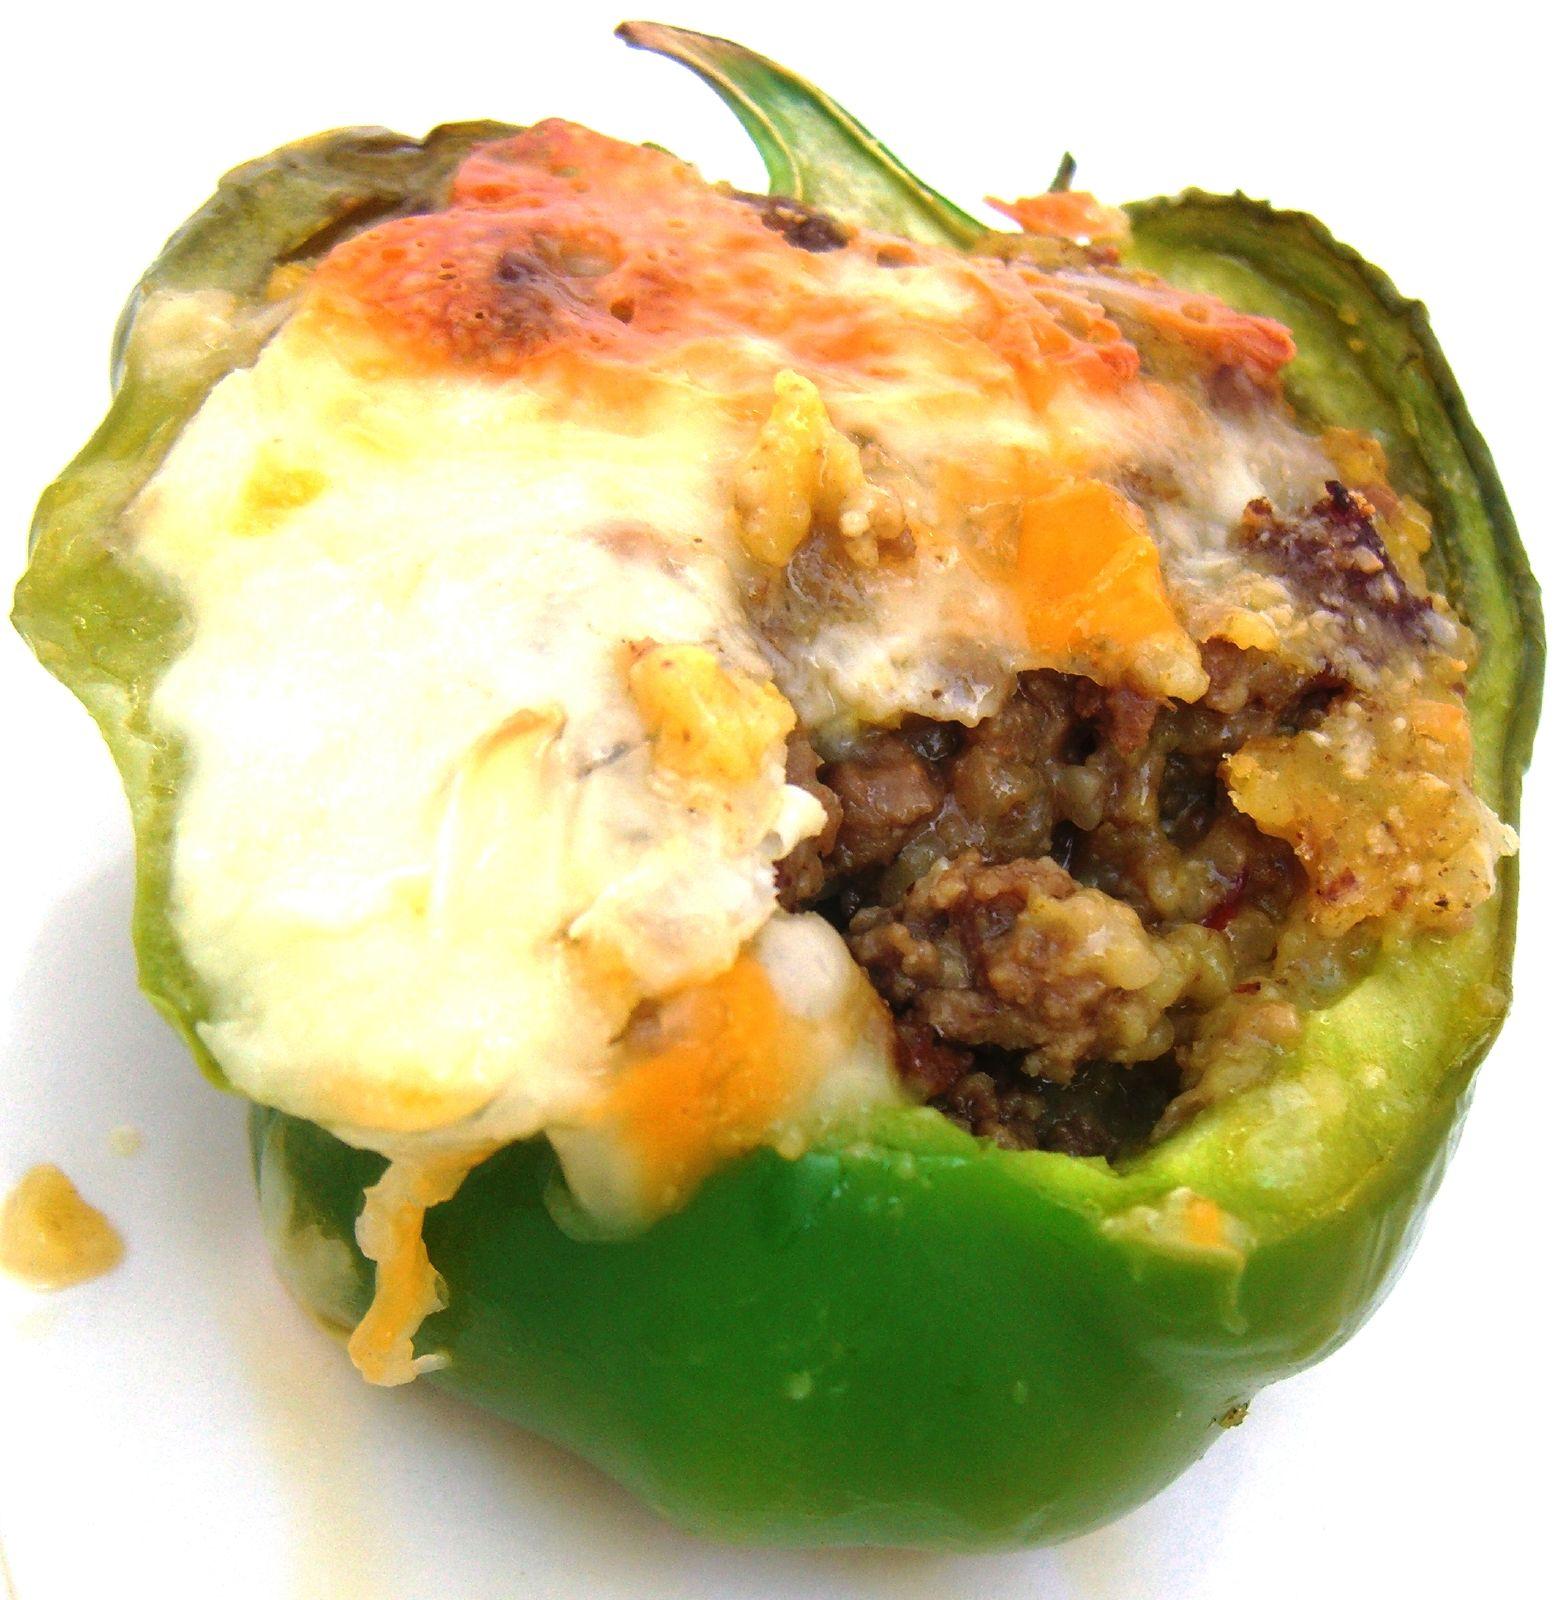 File:Stuffed pepper.jpg - Wikipedia, the free encyclopedia